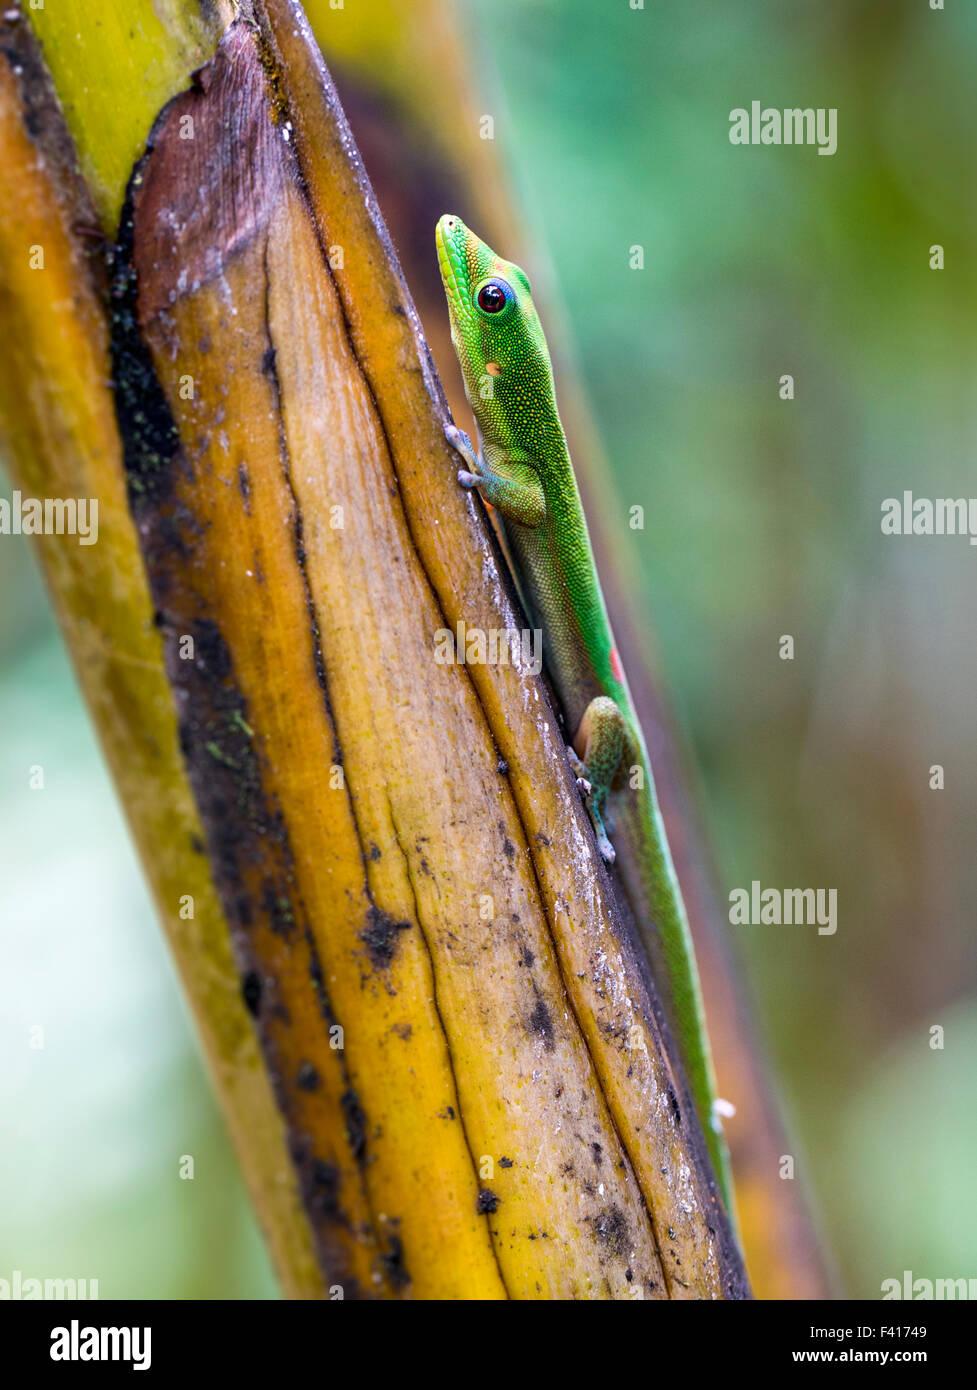 Madagaskar-Taggecko; Phelsuma Madagascariensis Madagascariensis; Hawaii Tropical Botanical Garden Naturschutzgebiet; Stockbild